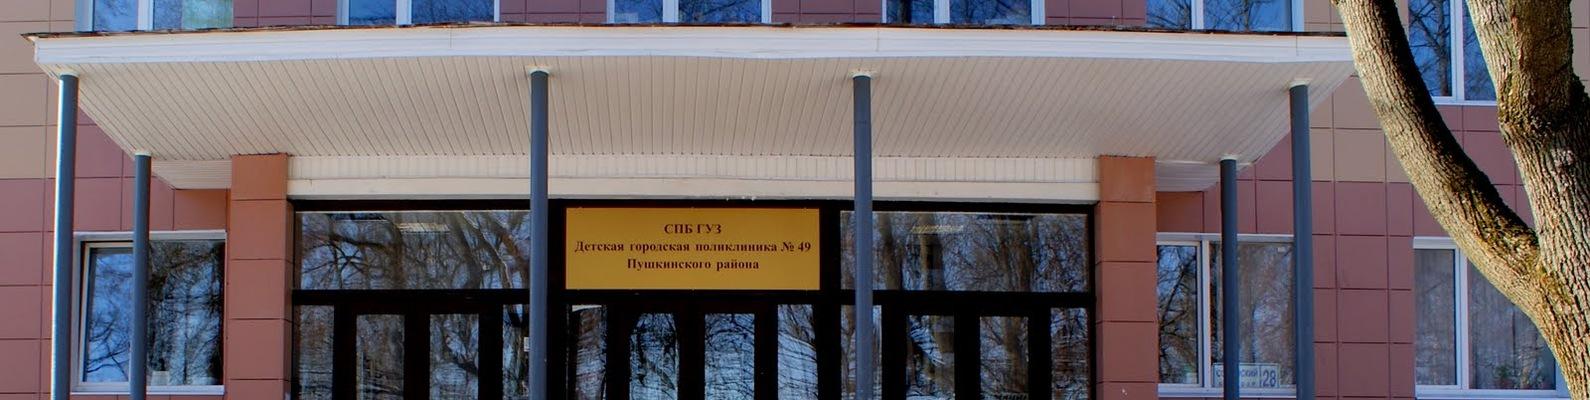 740fe229e6bdb Детская поликлиника № 49 г. Пушкин | ВКонтакте